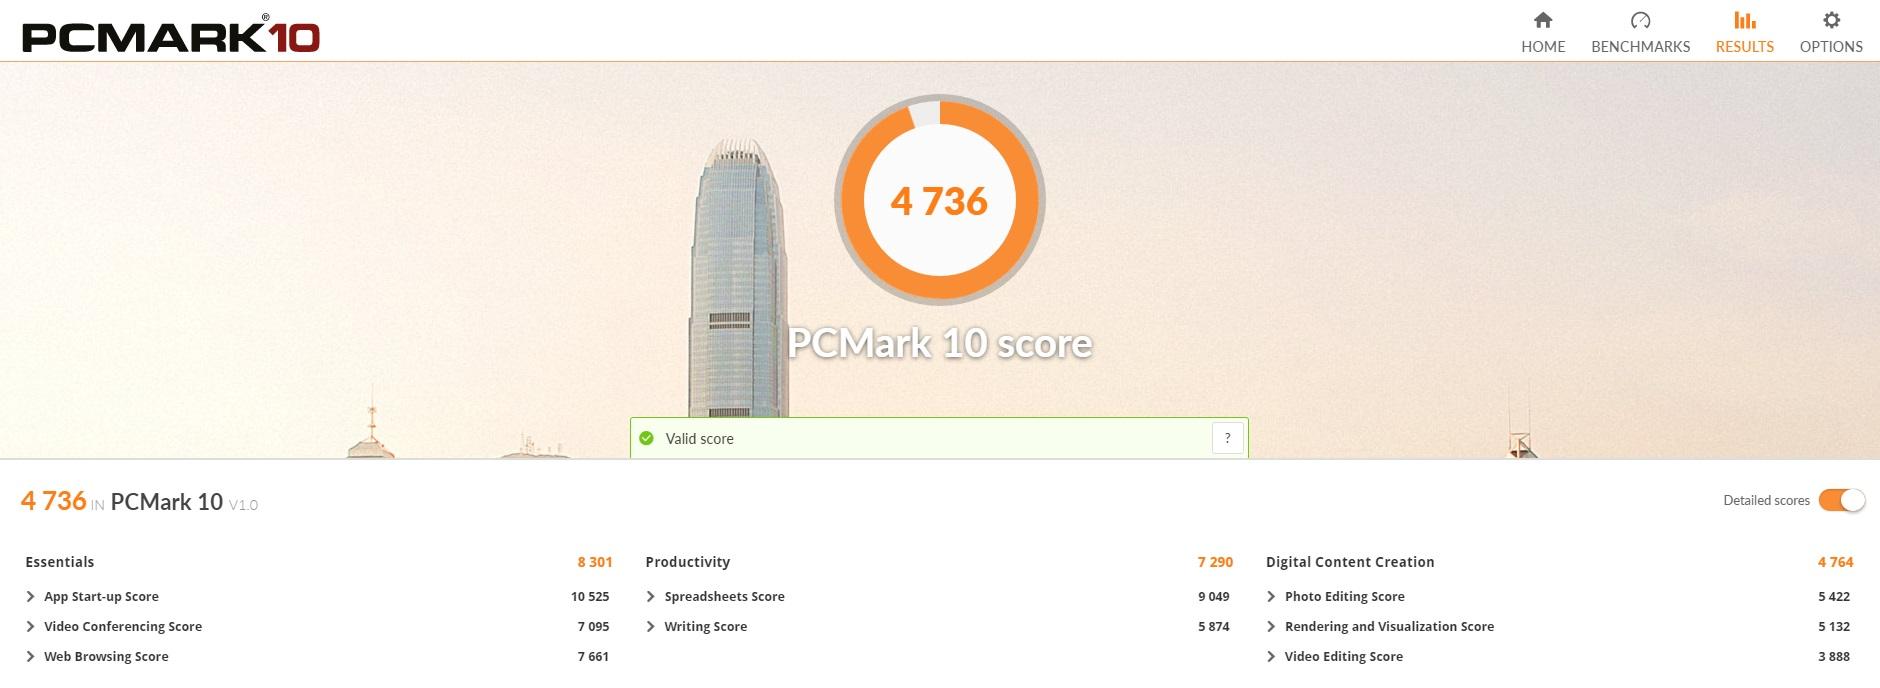 Am testat cateva jocuri cu laptopul ACER NITRO 5 (AN515-52-50YX) echipat cu placa grafica GTX 1050TI-pcmark10